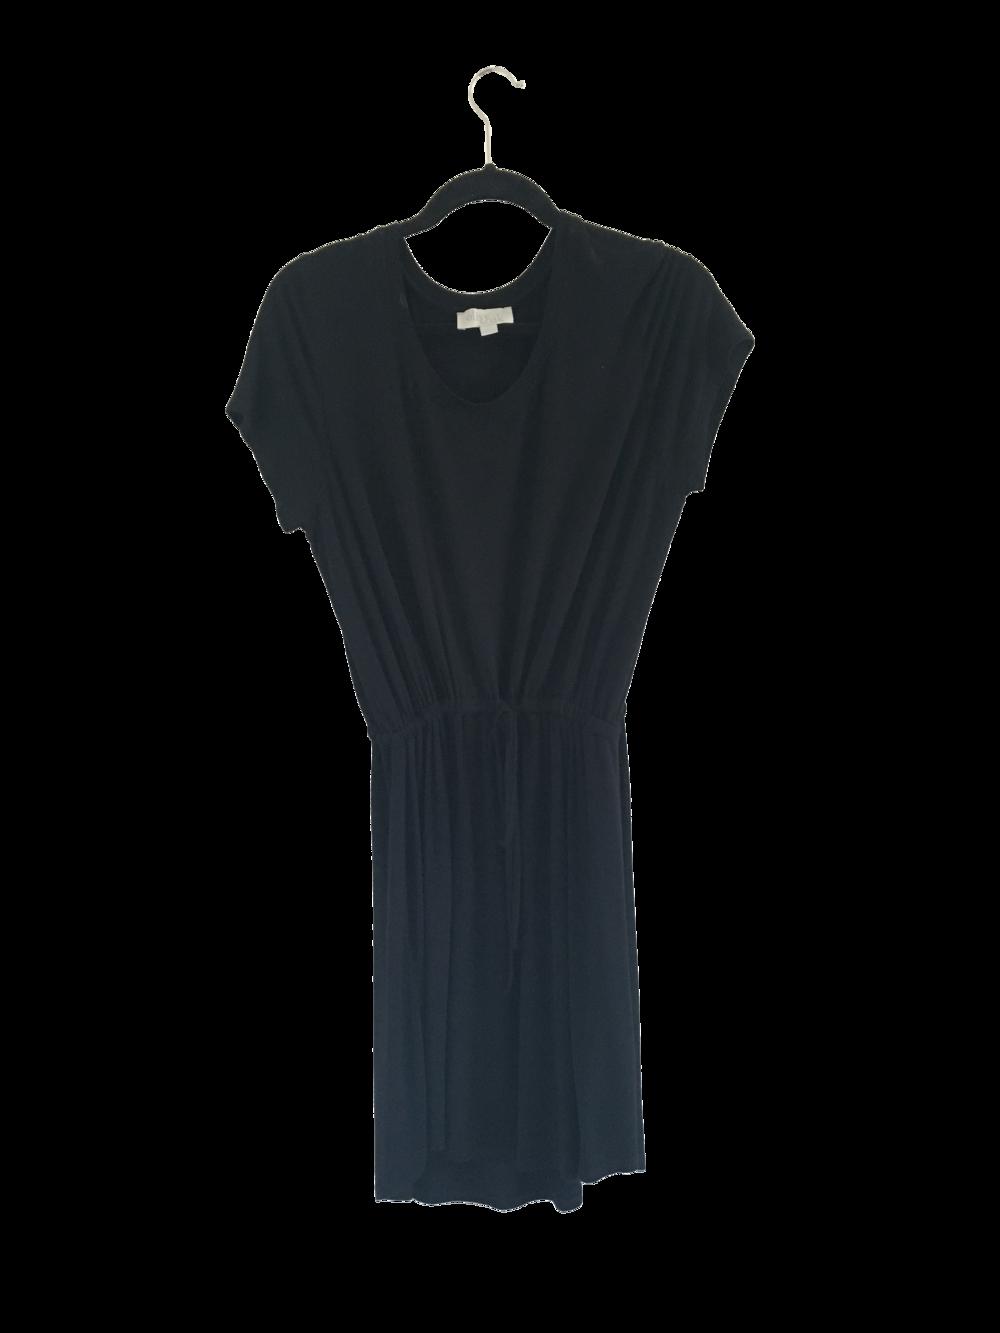 Black Dress Sleeve.png